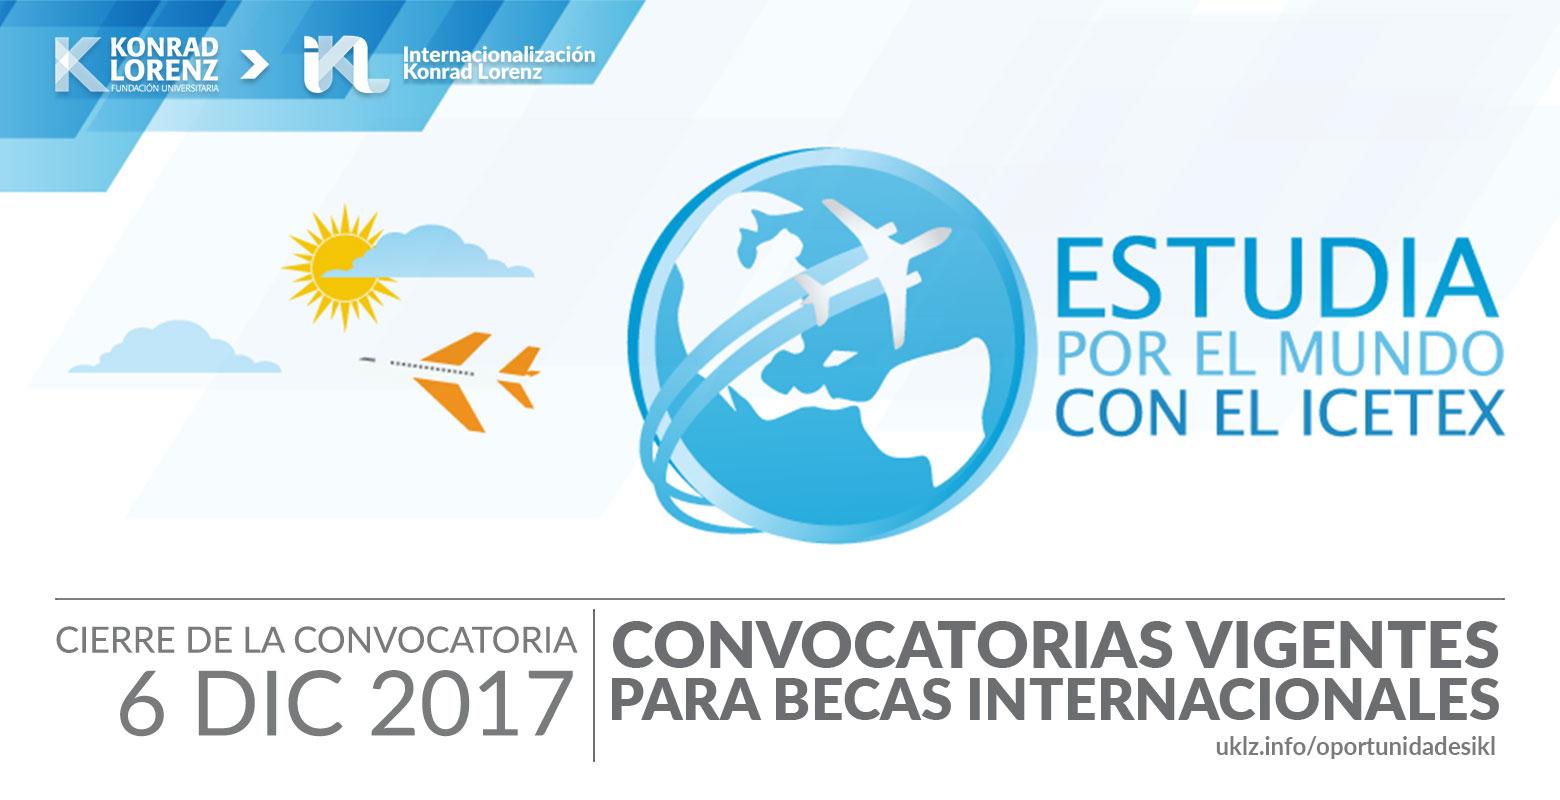 Convocatorias vigentes para becas internacionales ICETEX